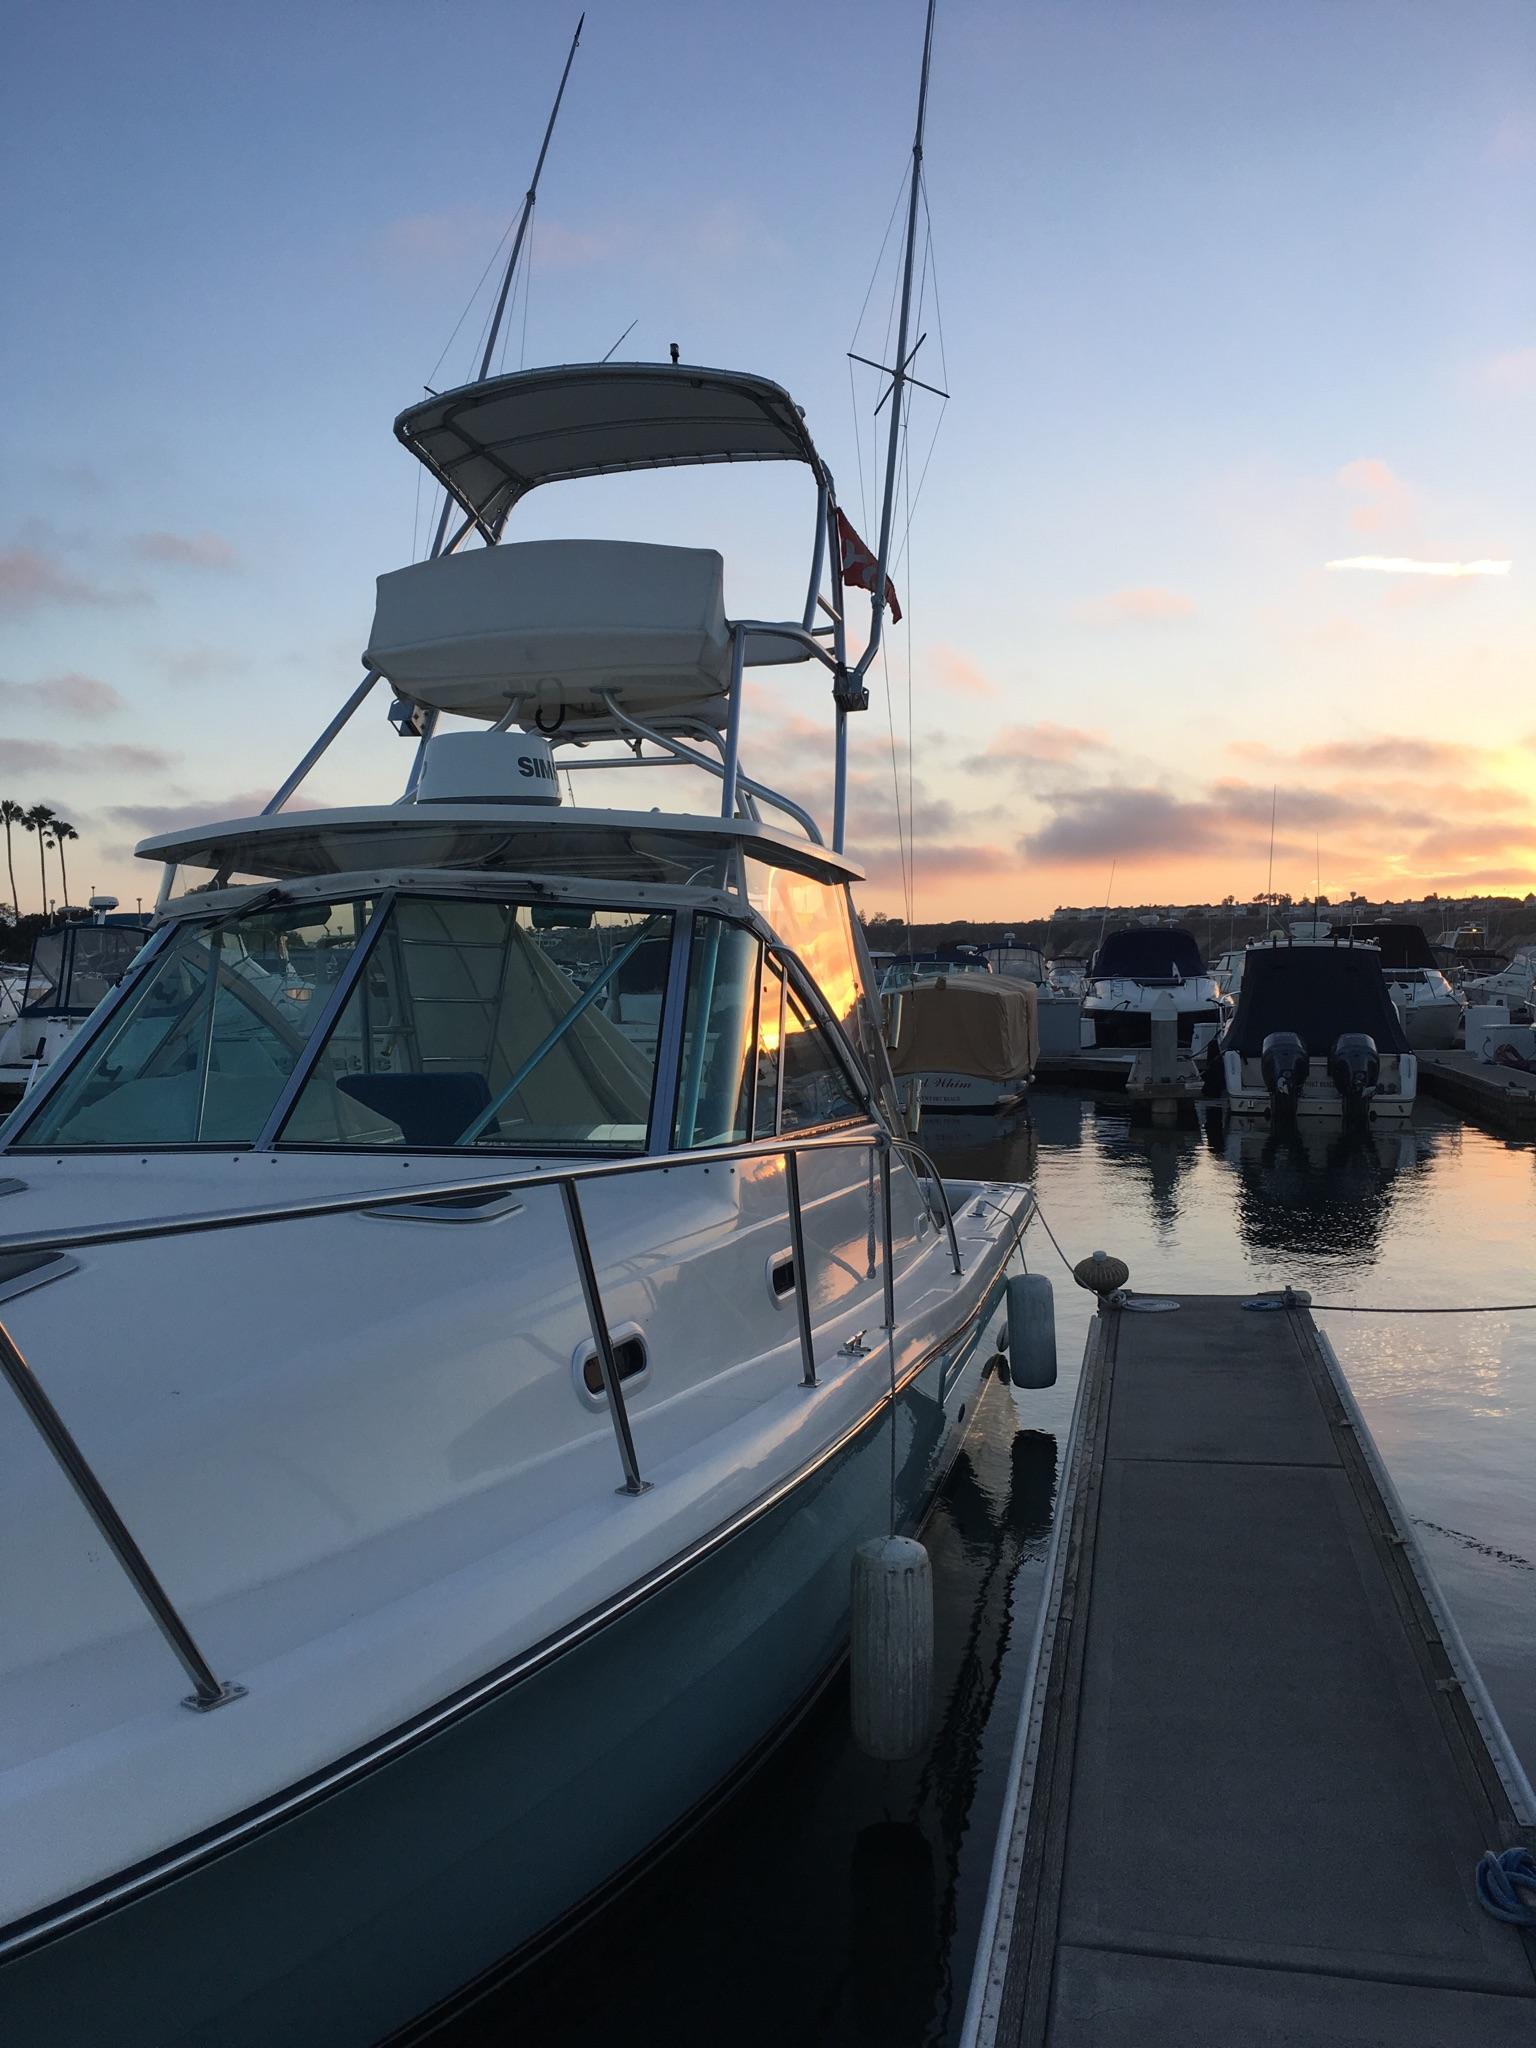 Reel Axe'n - Newport Beach